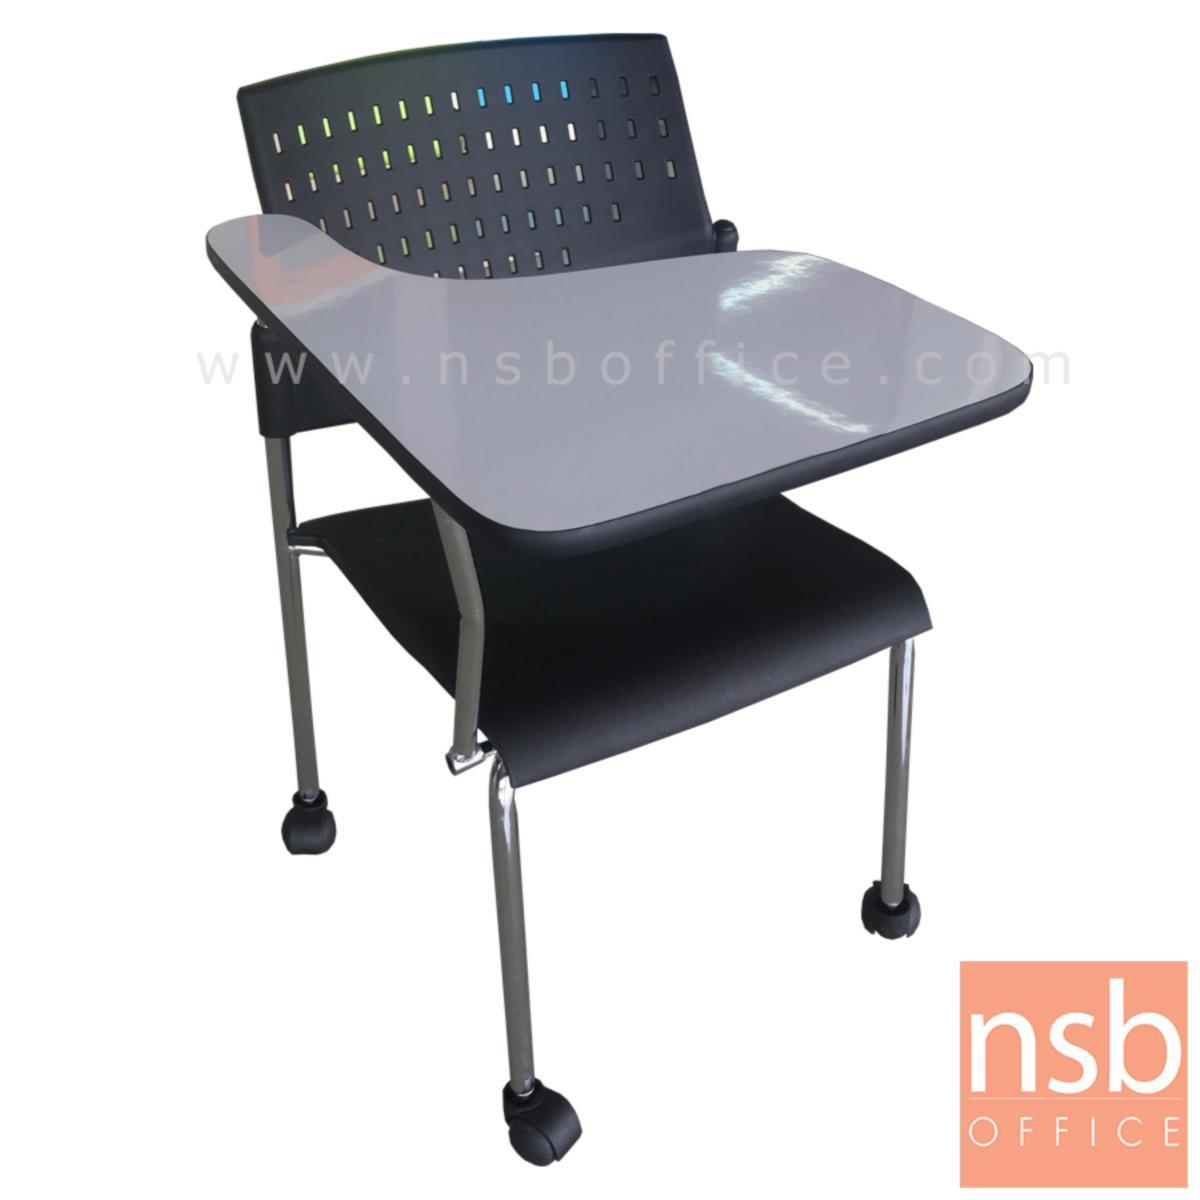 B07A080:เก้าอี้เลคเชอร์เฟรมโพลี่ล้อเลื่อน รุ่น Sylvia (ซิลเวียร์)  ขาเหล็กชุบโครเมี่ยม